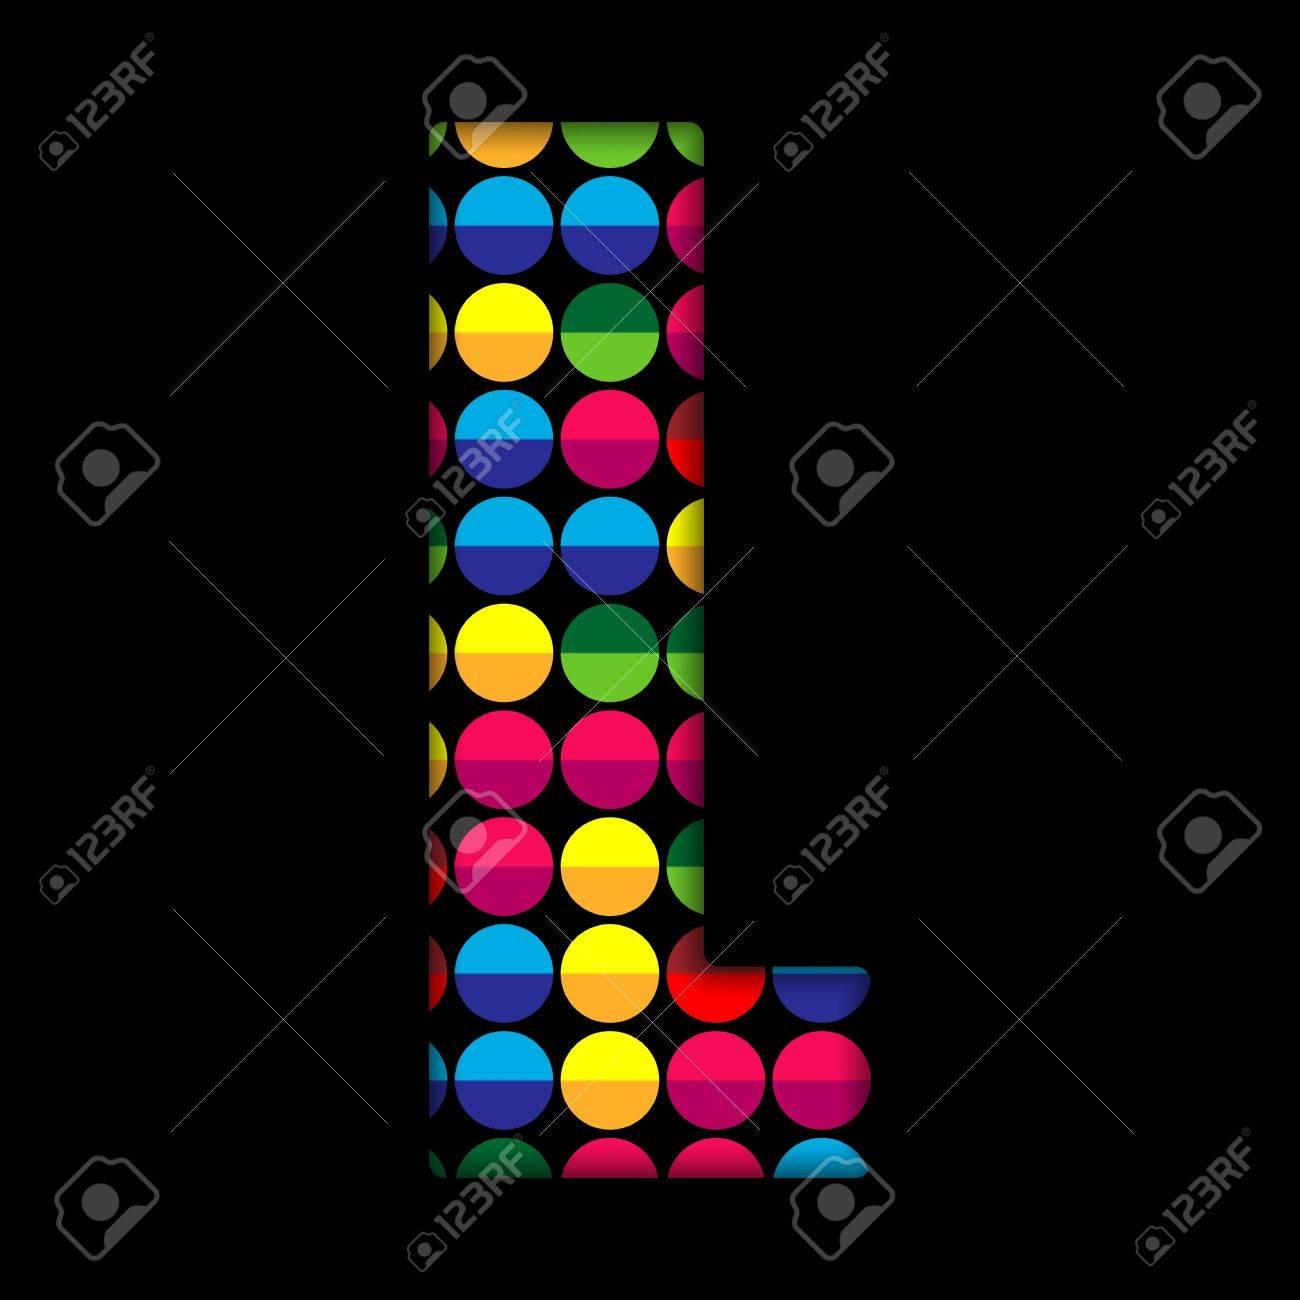 Alphabet Dots Color on Black Background L Stock Vector - 15809839